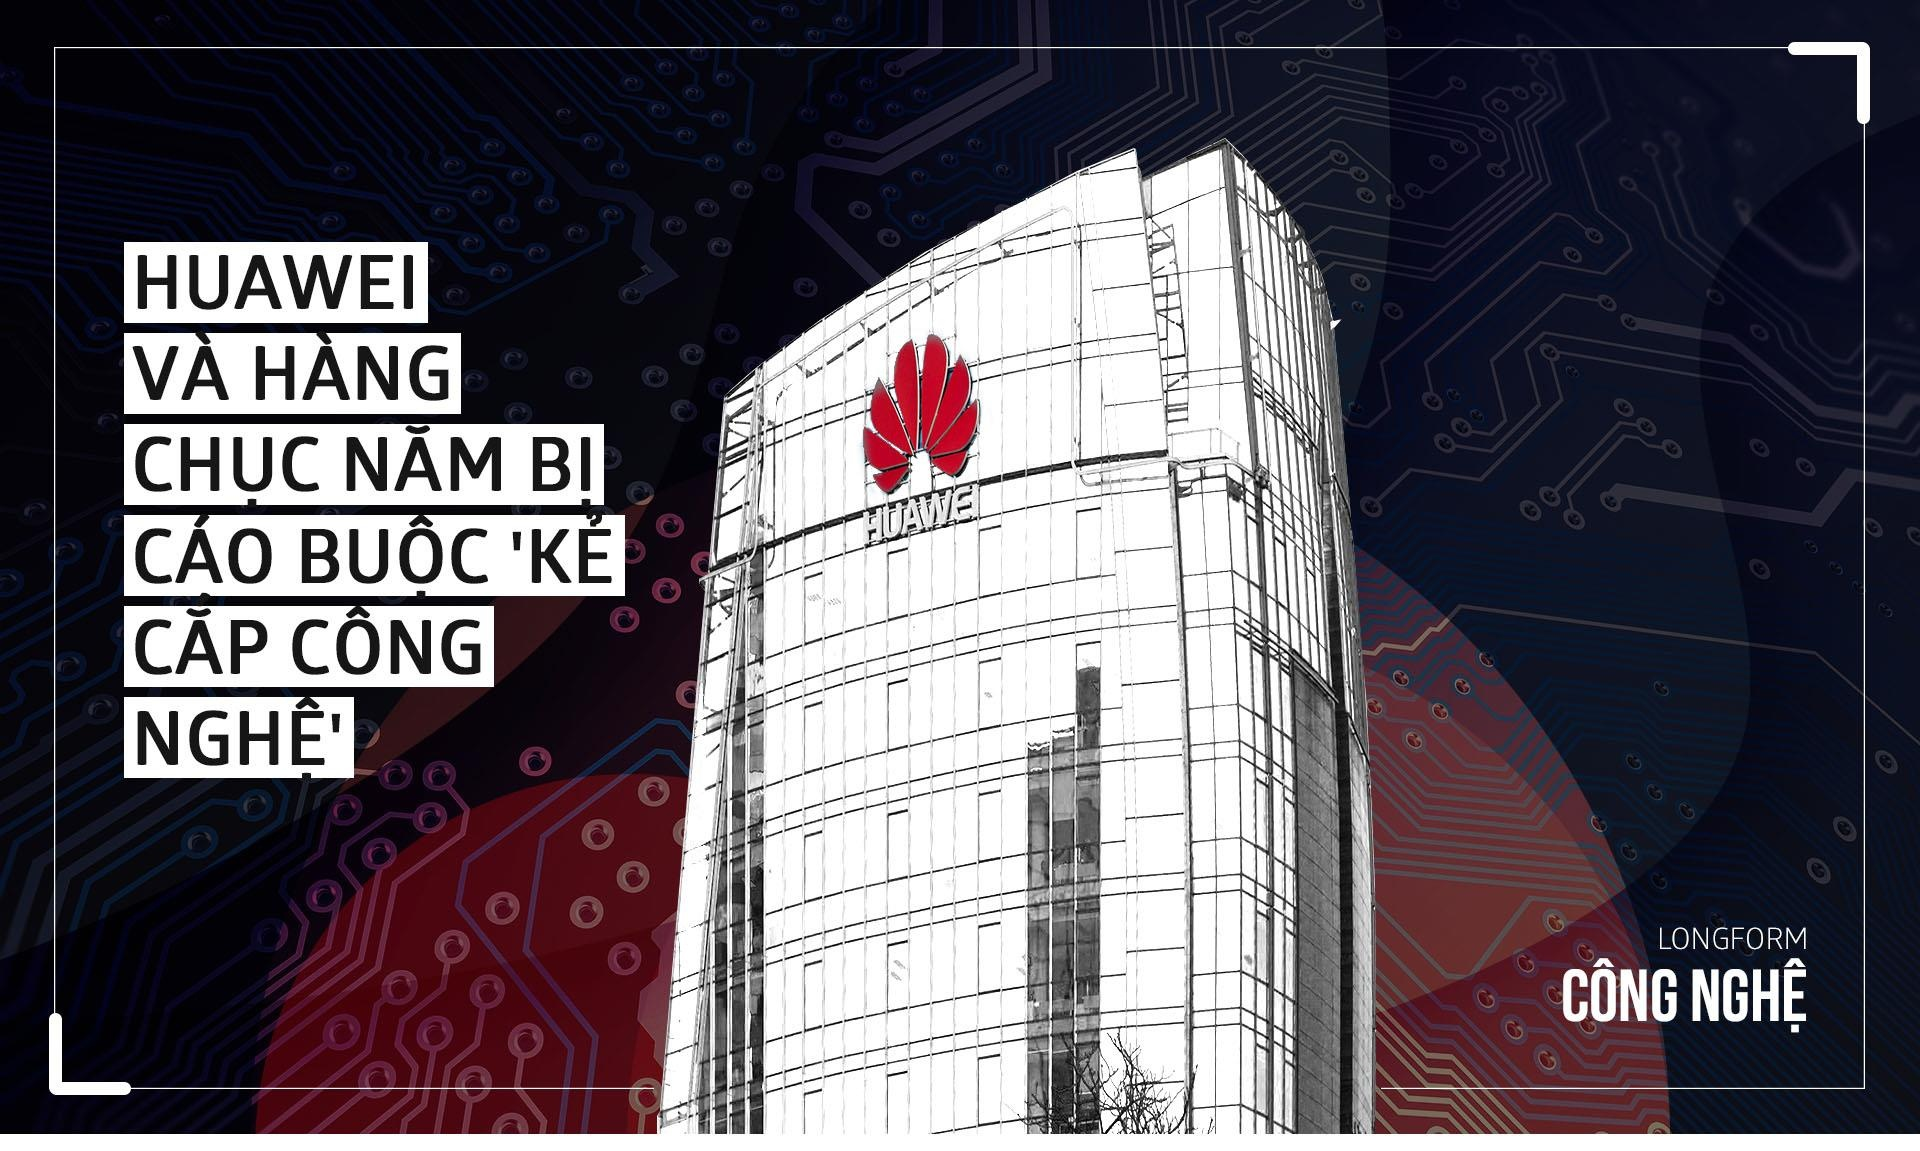 Day la cach Huawei thu thap cong nghe hang chuc nam qua hinh anh 2